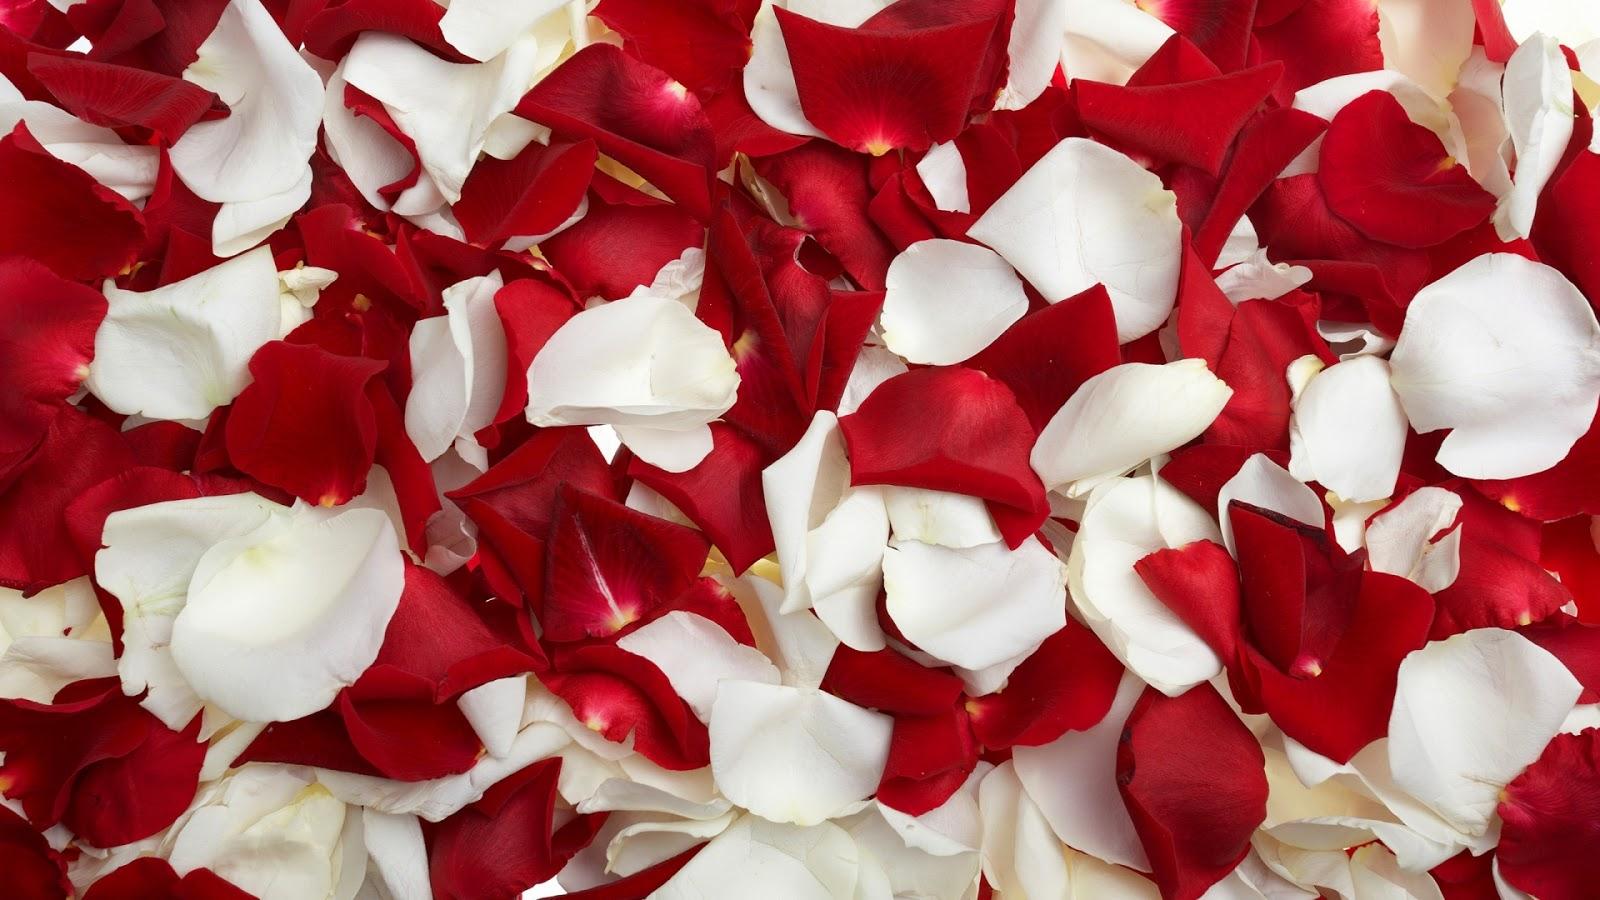 valentines day red petals heart wallpaper